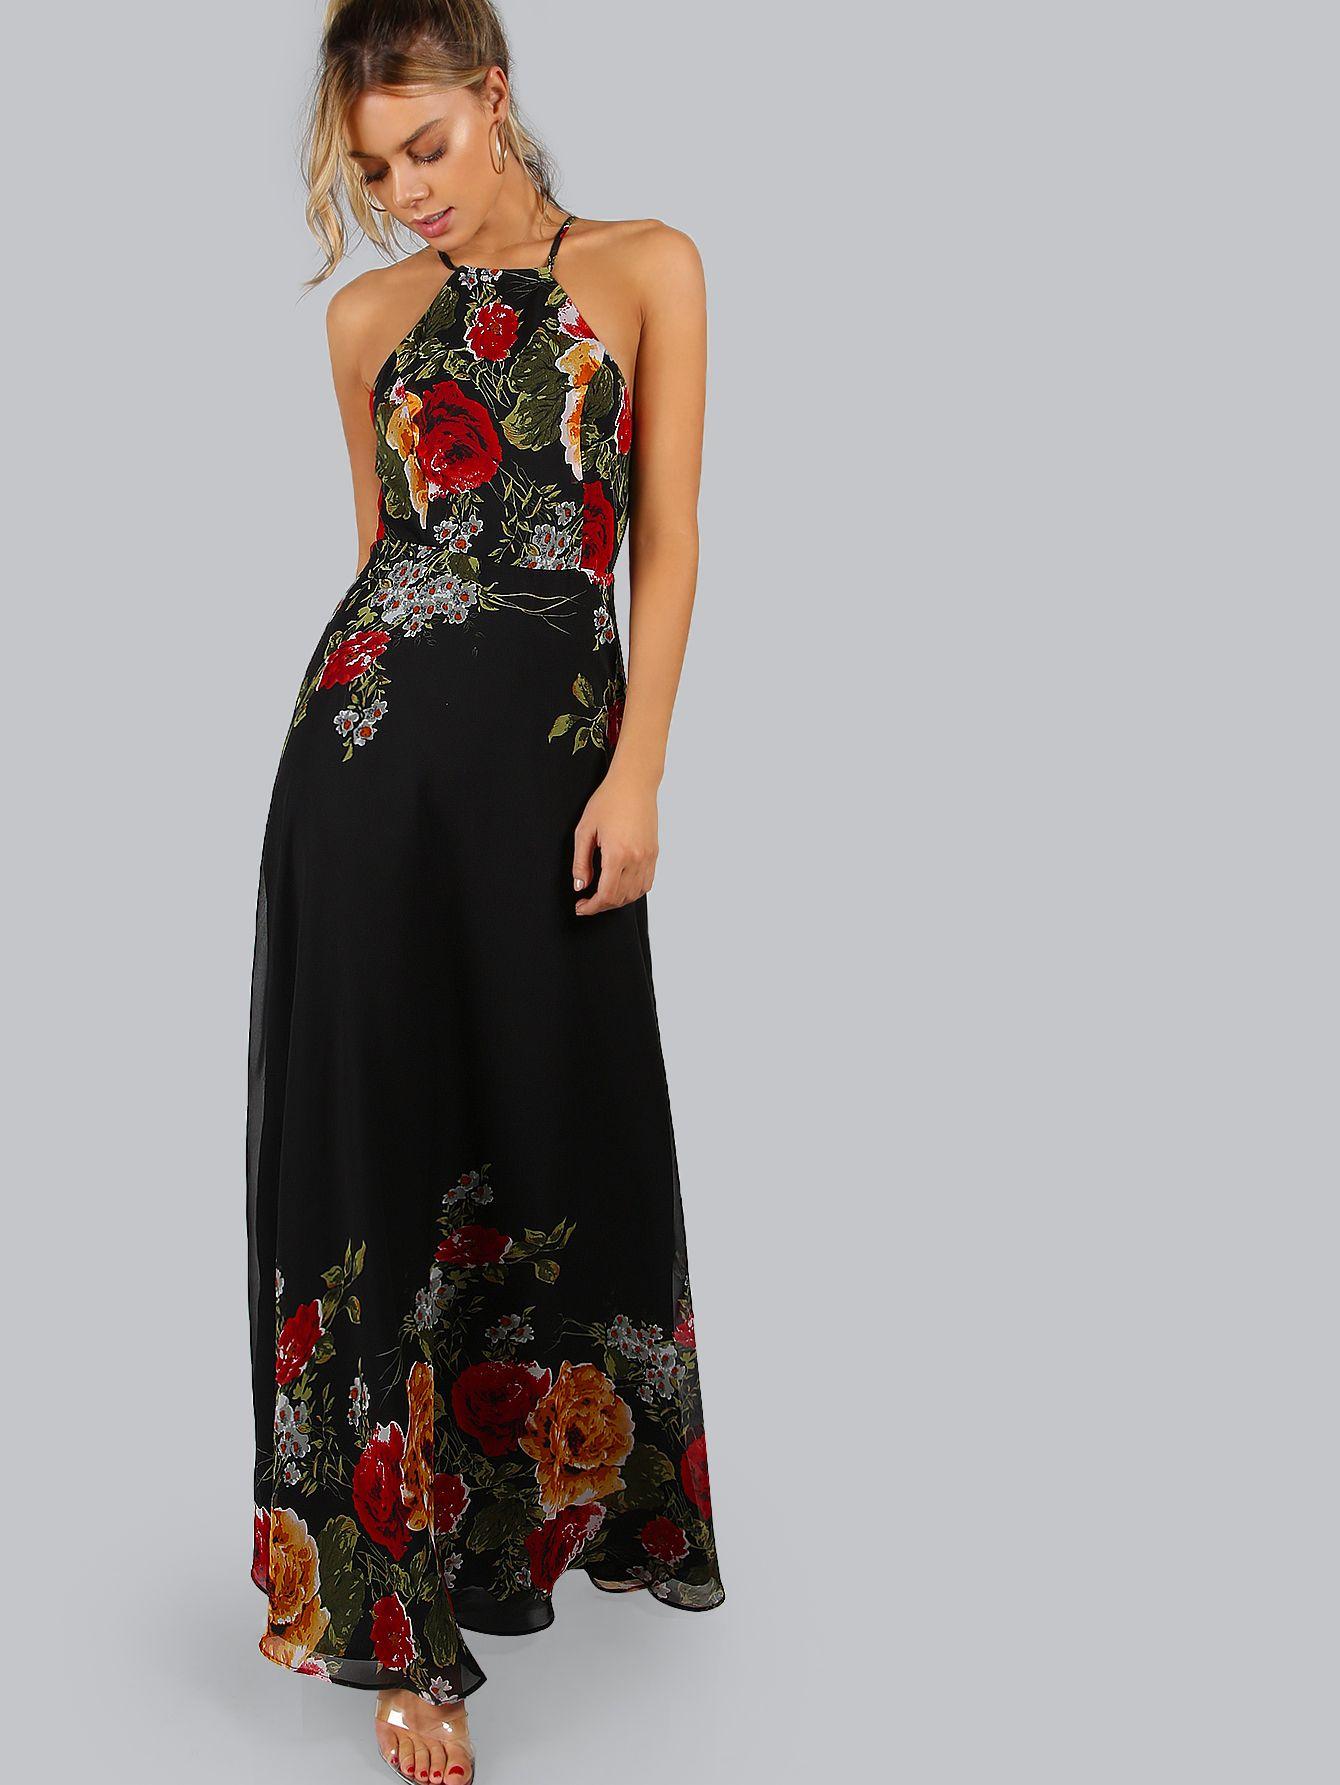 Shop Black Flower Print Halter Neck Open Back Maxi Dress online. SheIn  offers Black Flower Print Halter Neck Open Back Maxi Dress   more to fit  your ... 36c50b9c1